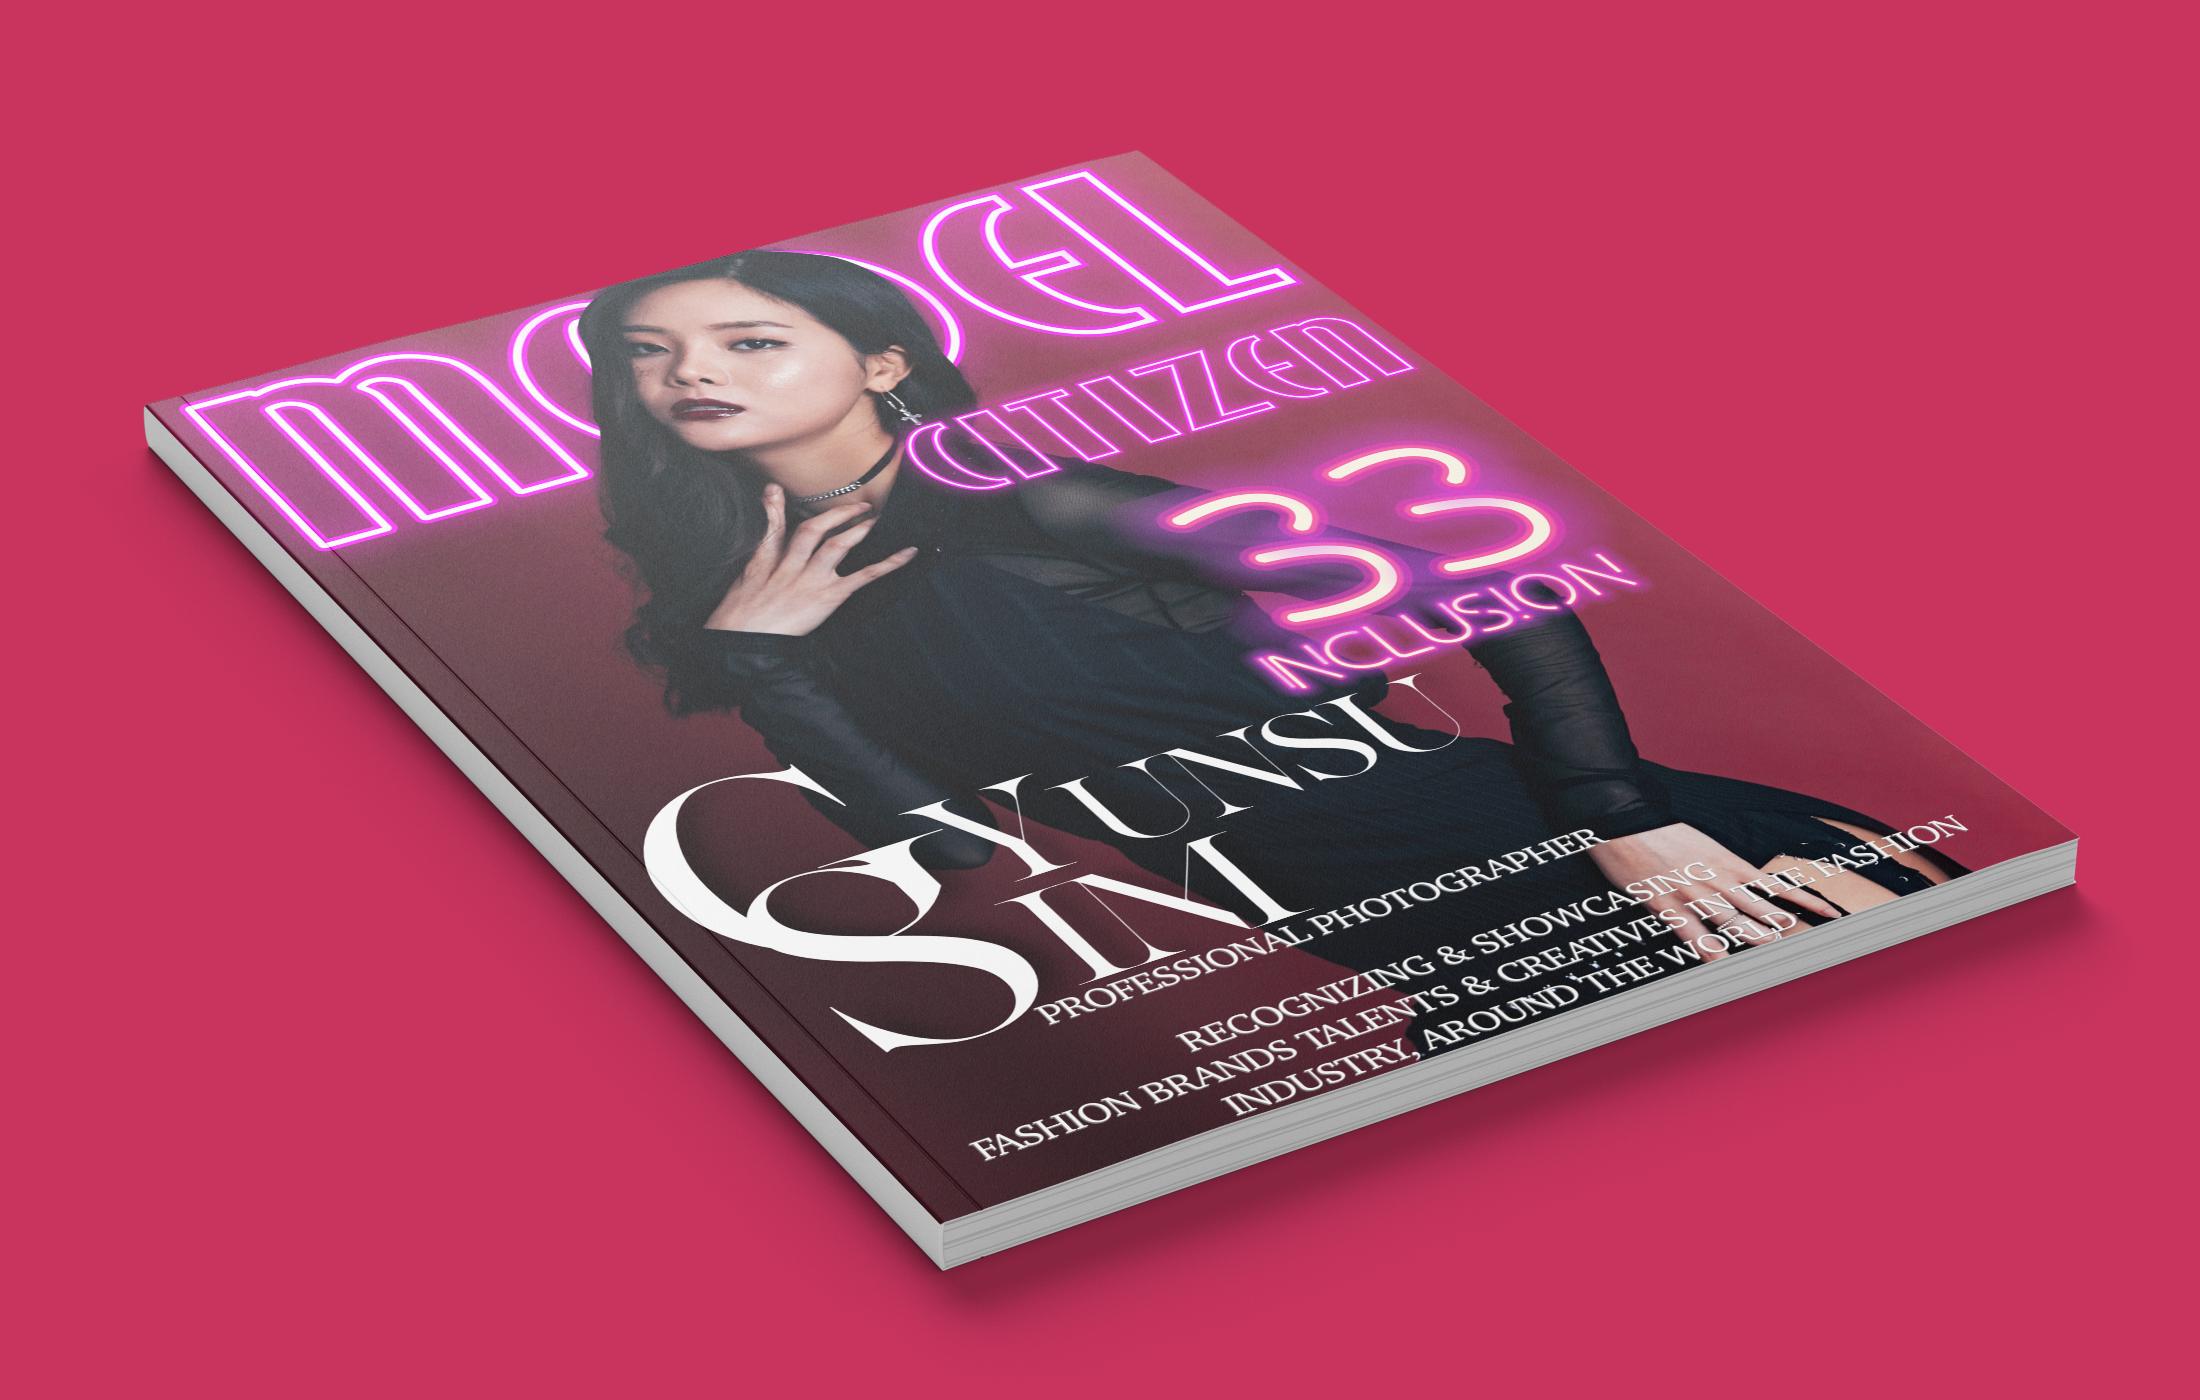 Model Citizen Magazine Issue 33, Macky Suson, Fashion Inclusion Now0.png